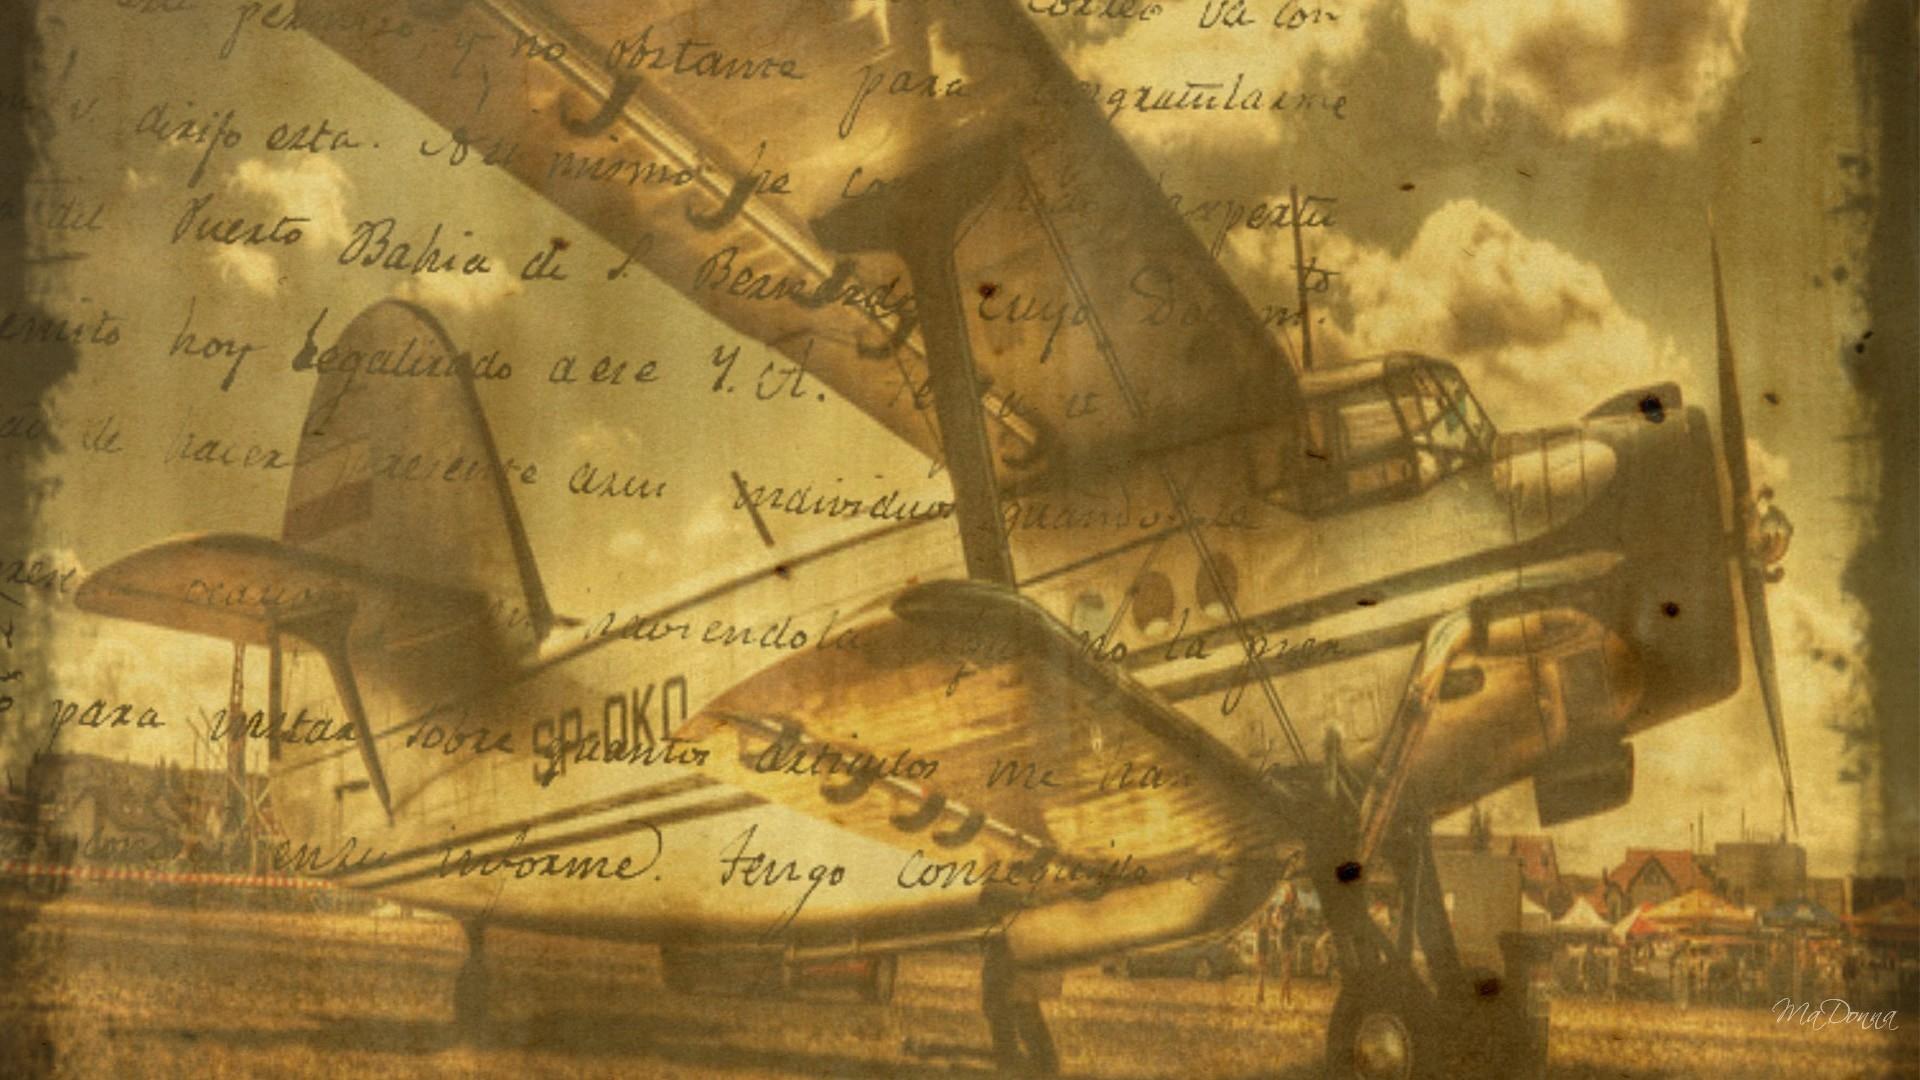 Old Plane Fondo De Pantalla Hd Fondo De Escritorio